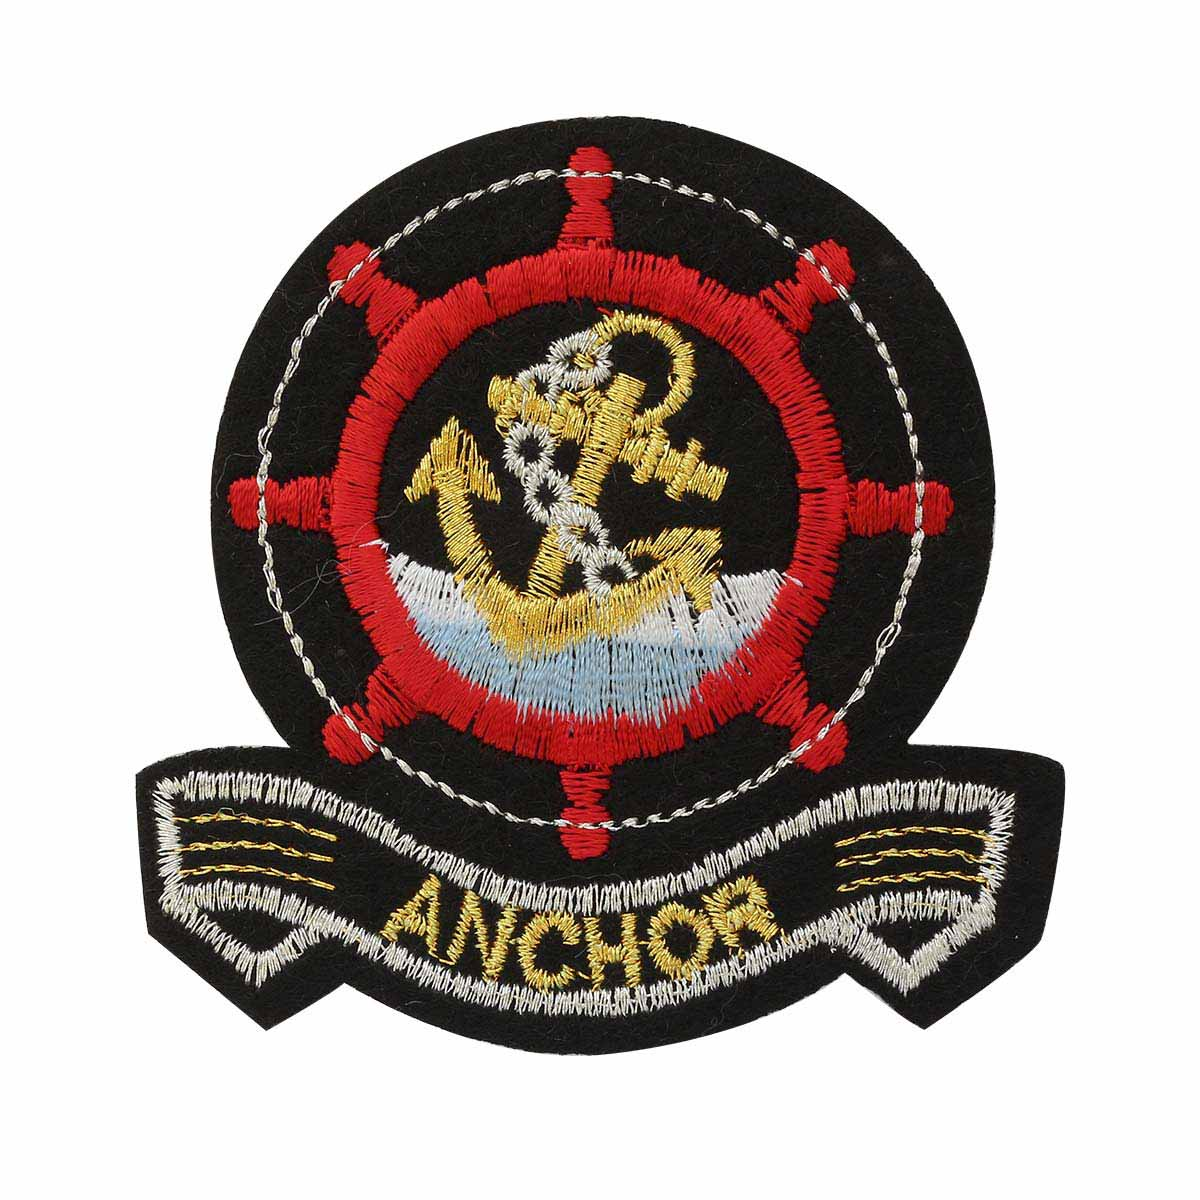 Термоаппликация LML212 'Anchor' 1шт Hobby&Pro basic